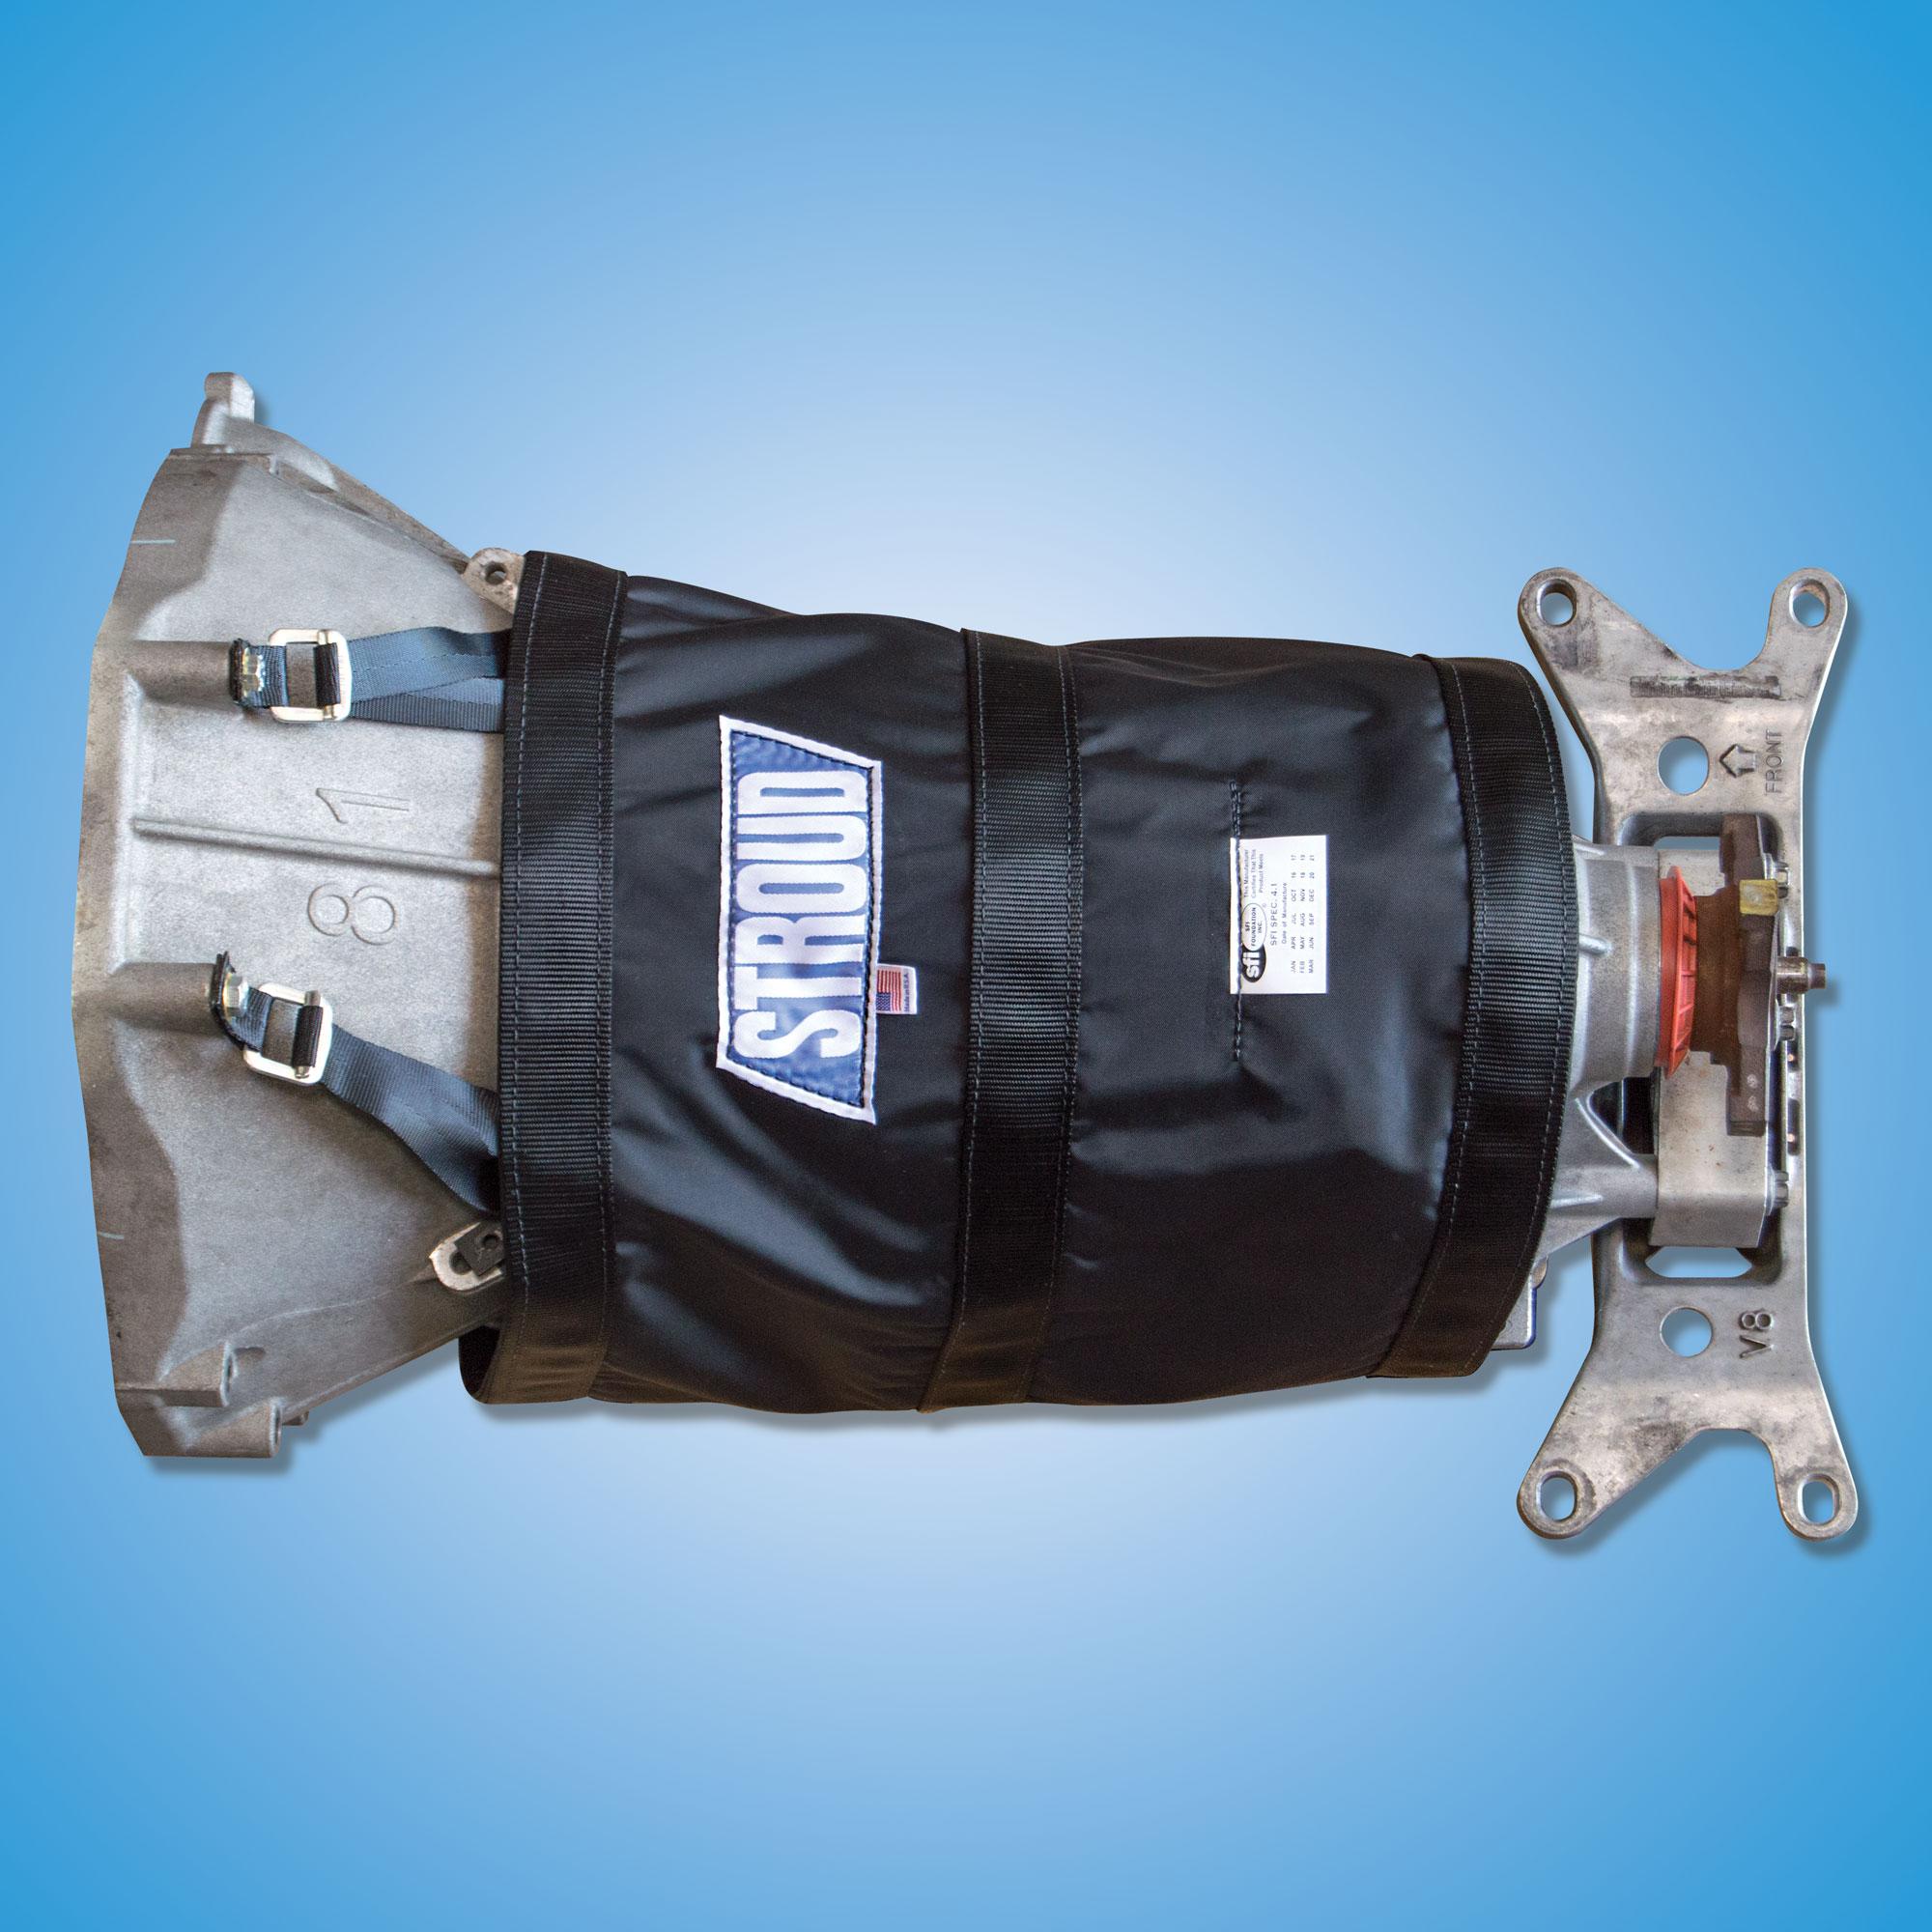 Fits Ford 6R80 Transmission, ballistic nylon   Part #6R80 — $239